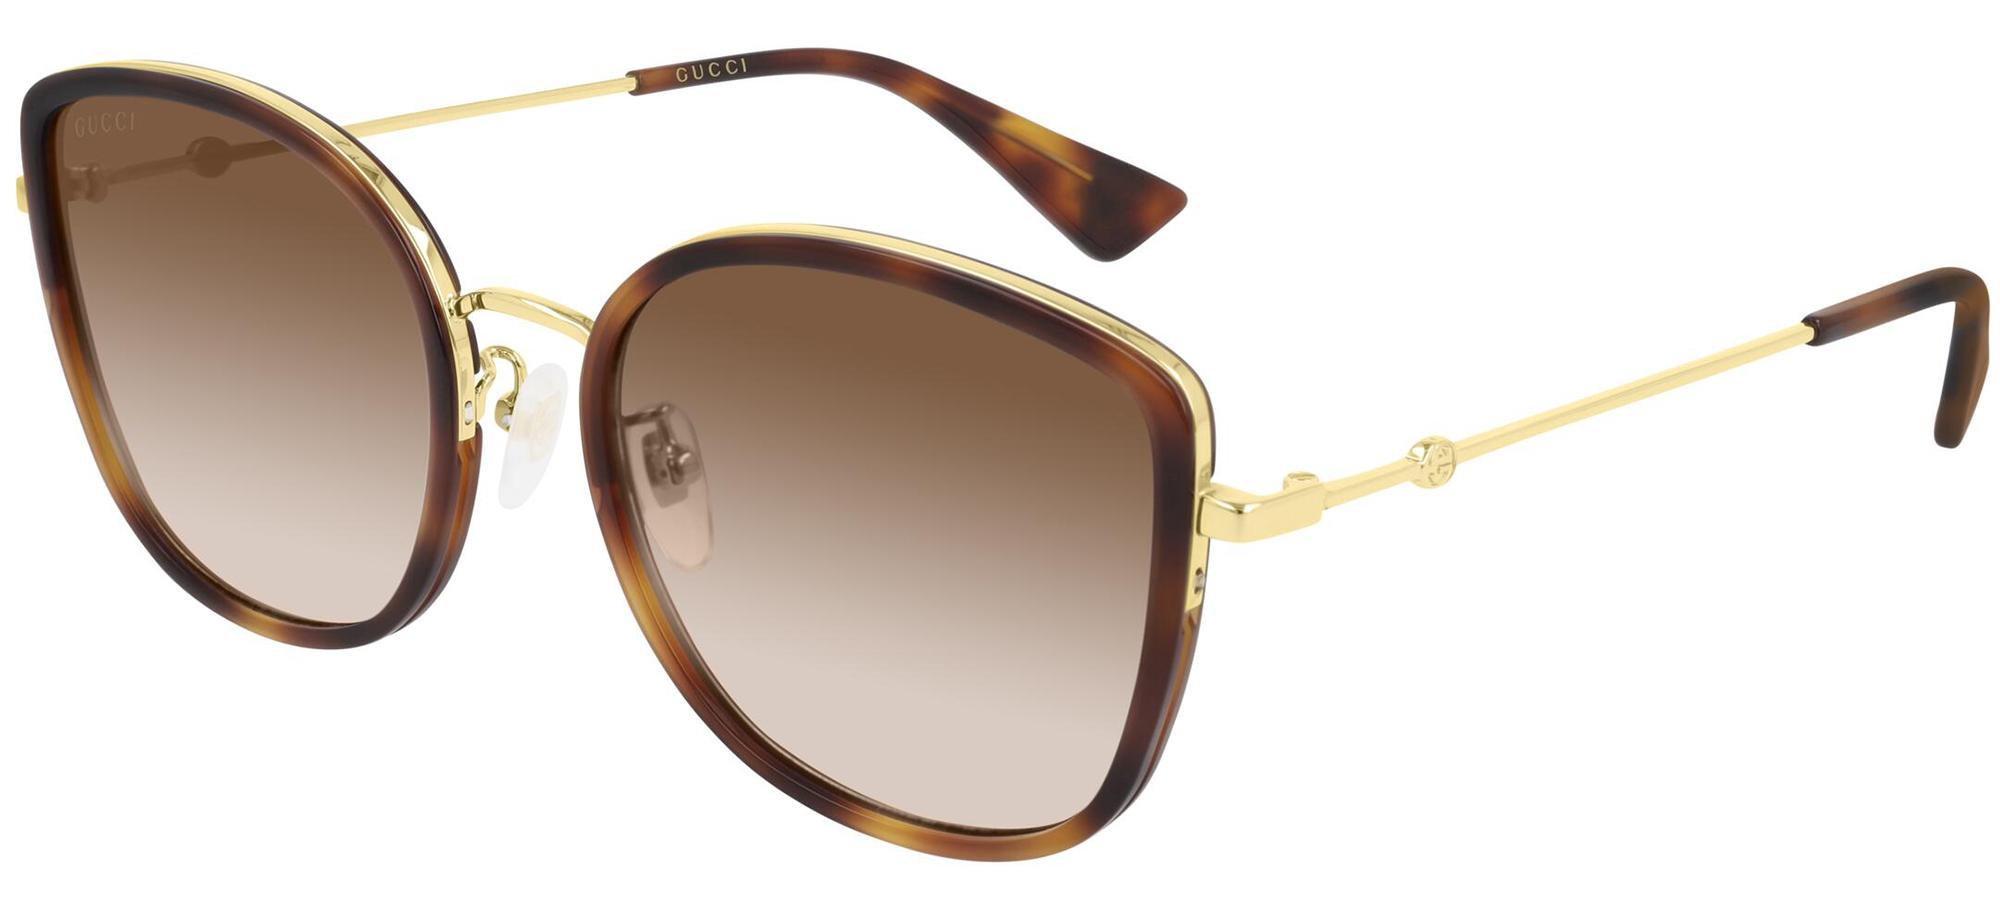 Sunglasses GUCCI original GG0606SK 004 56-19 Havana Gold